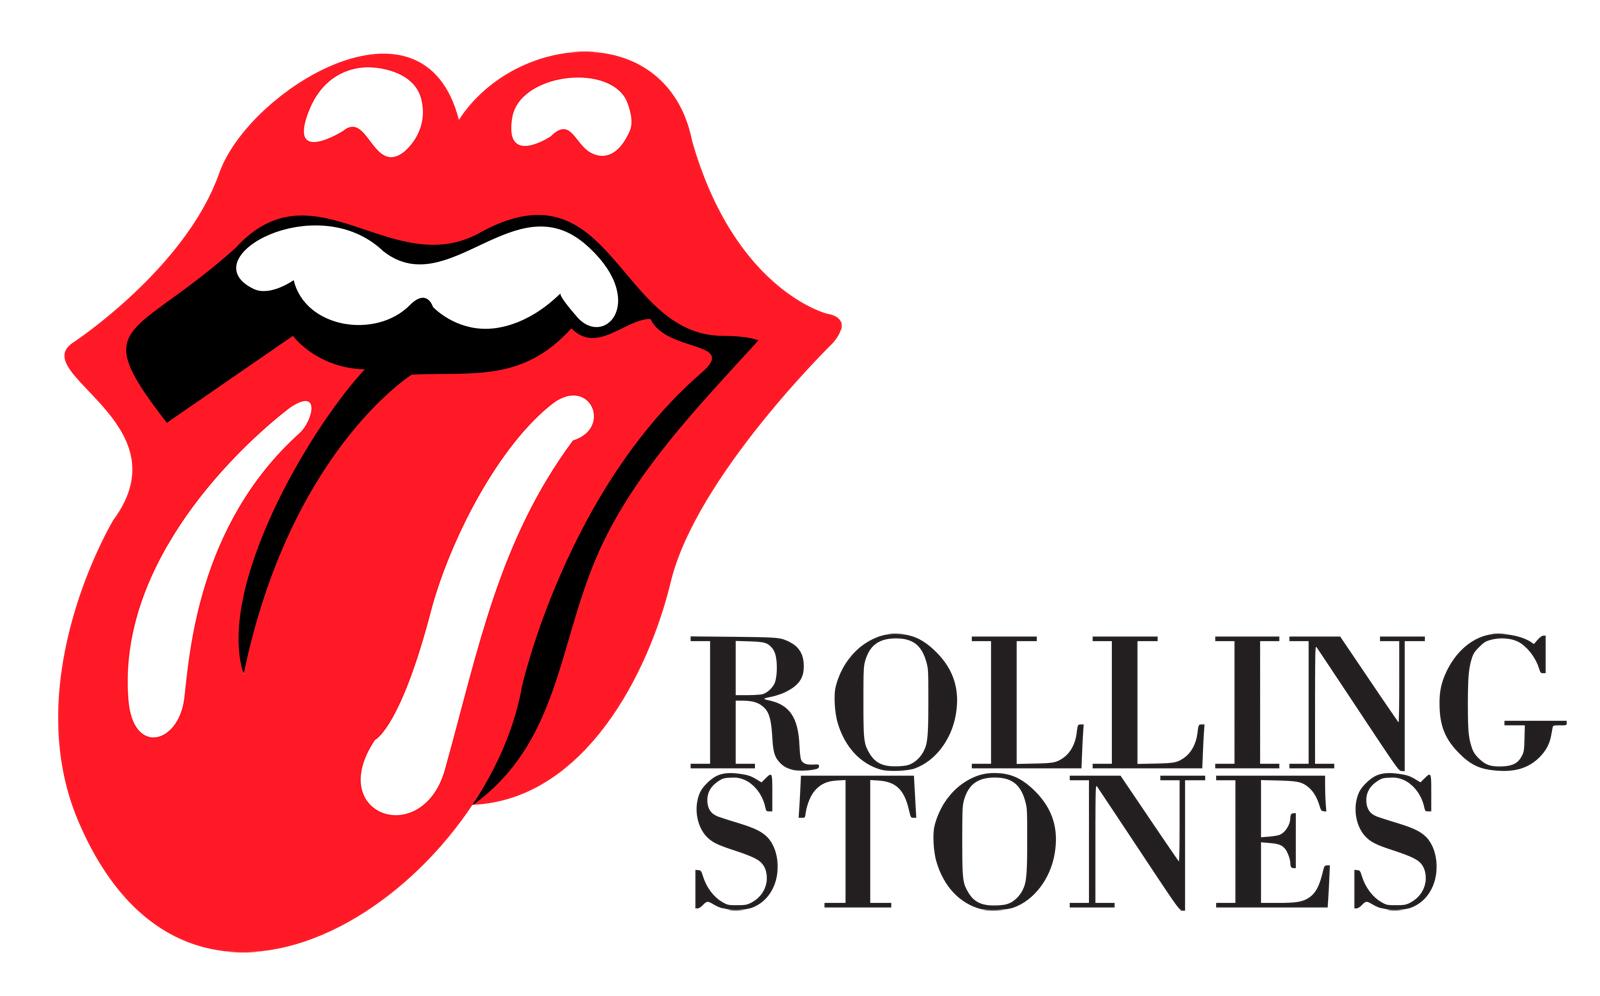 Rolling stones lips Logos